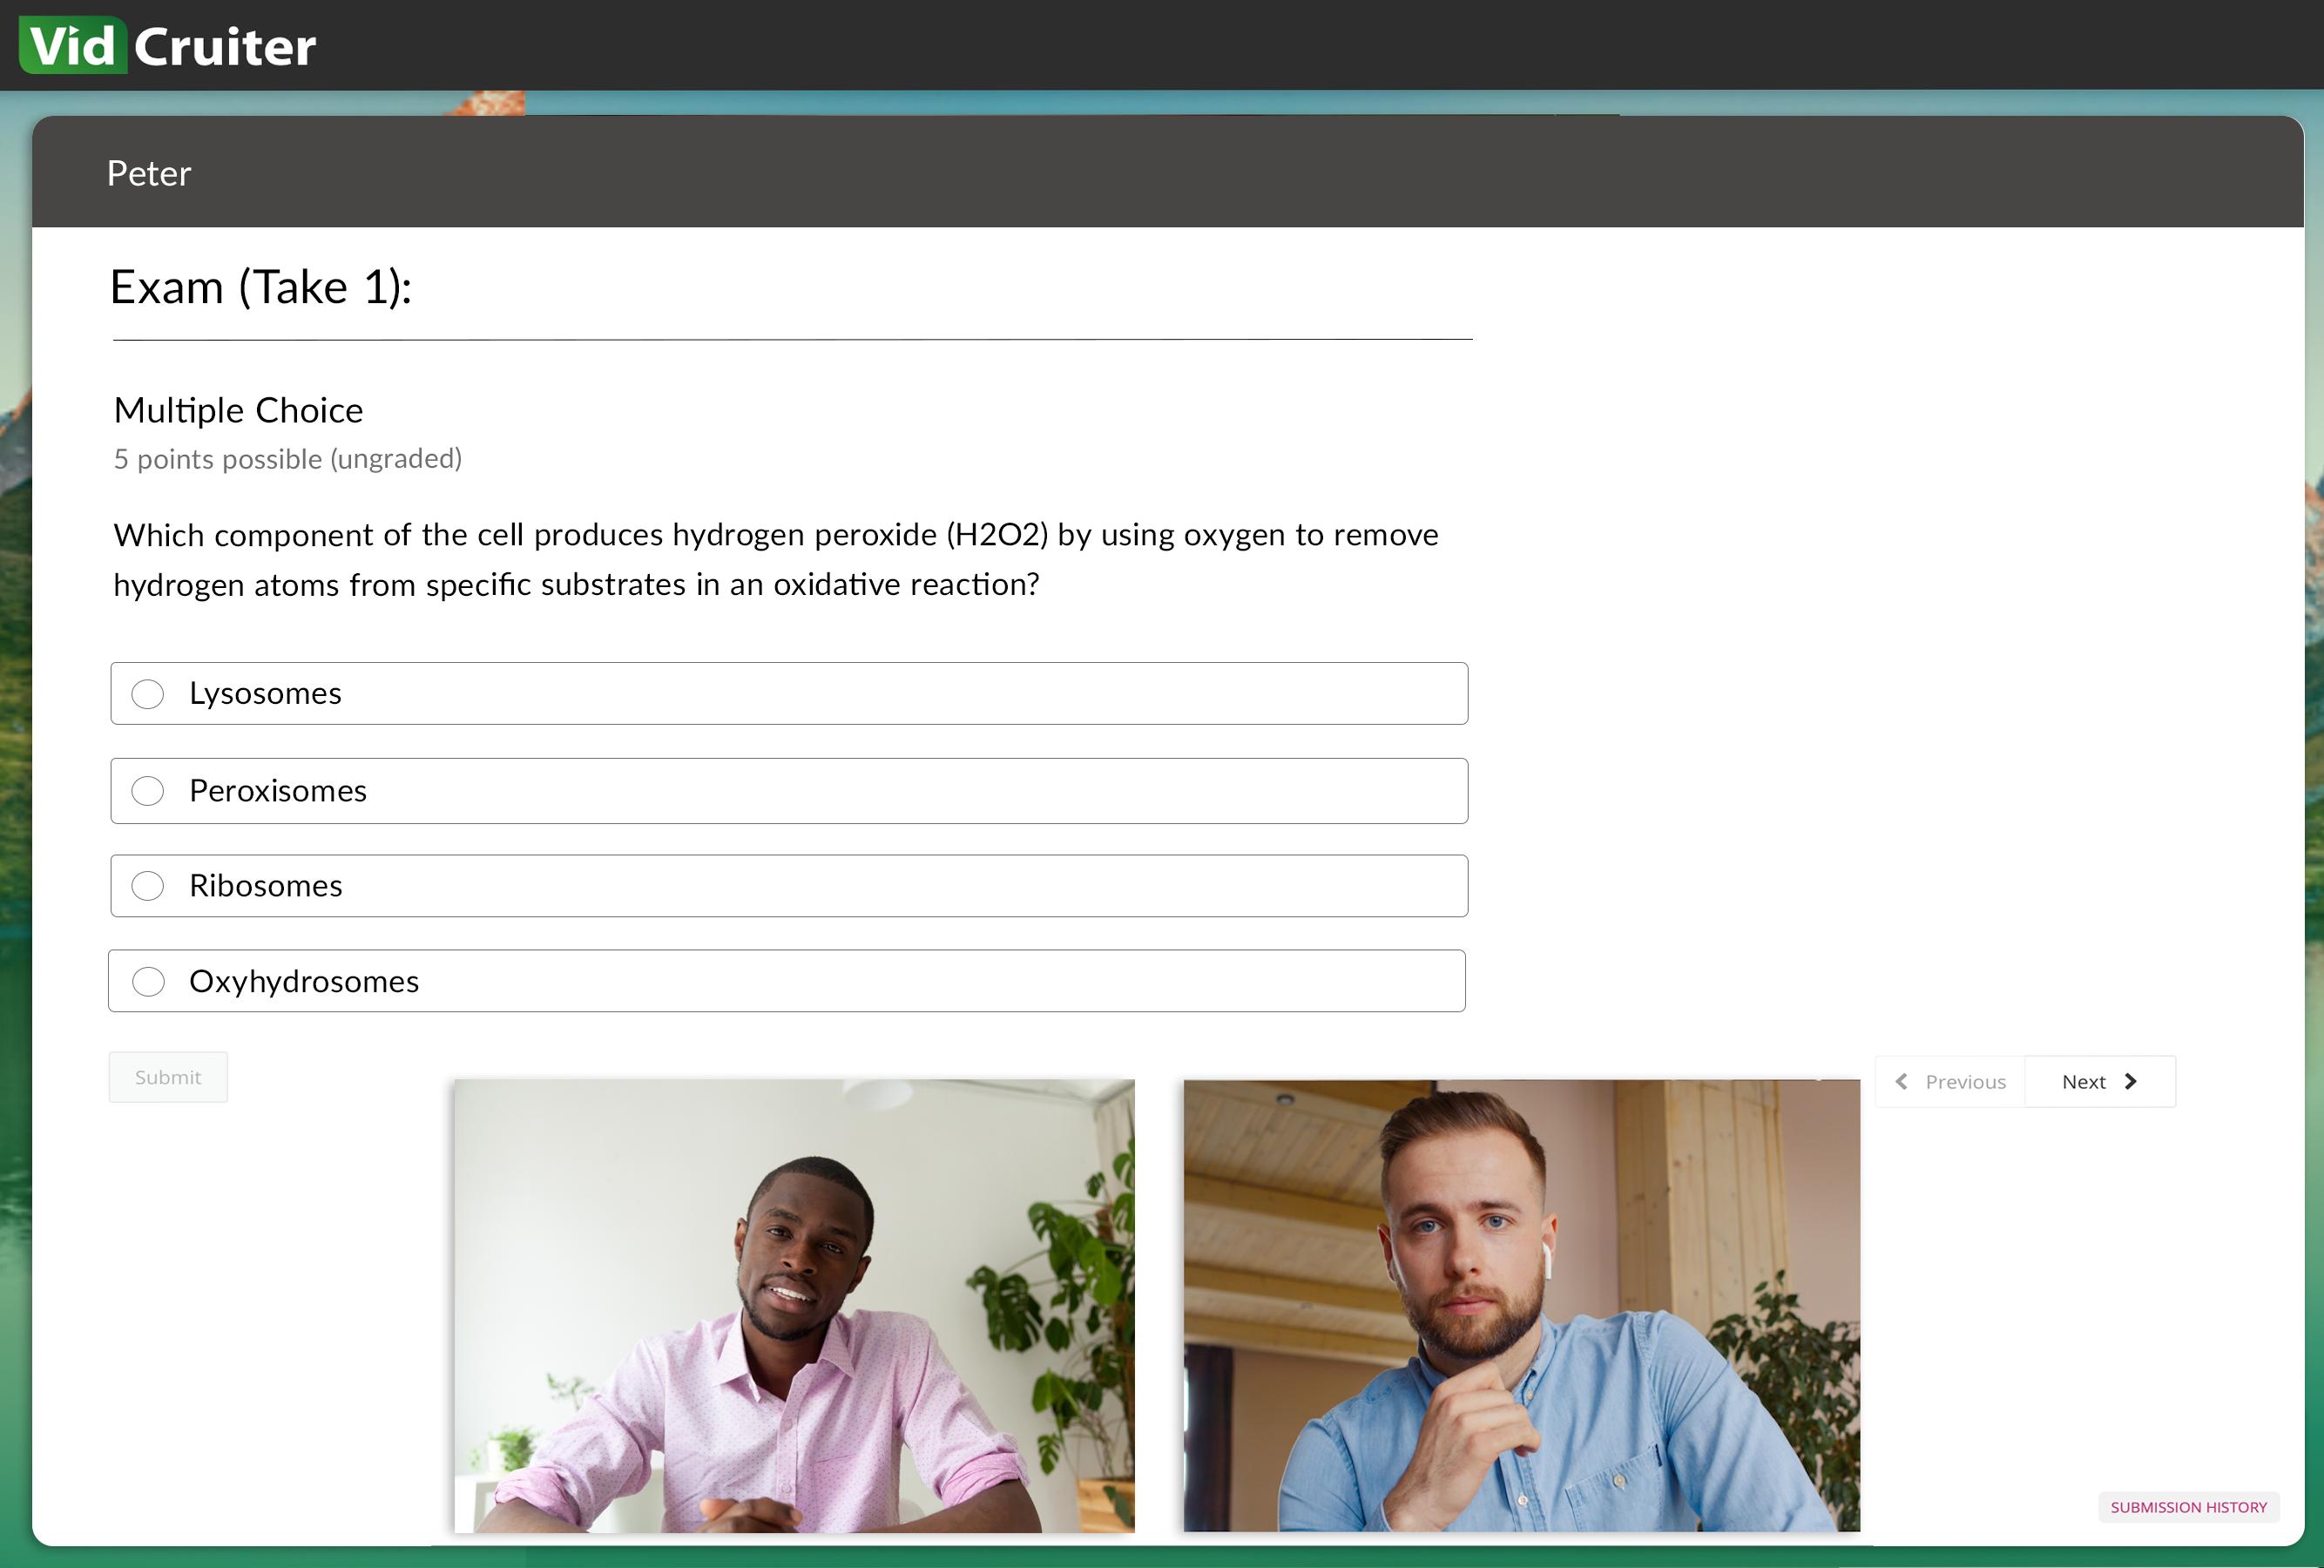 Human proctored online testing software